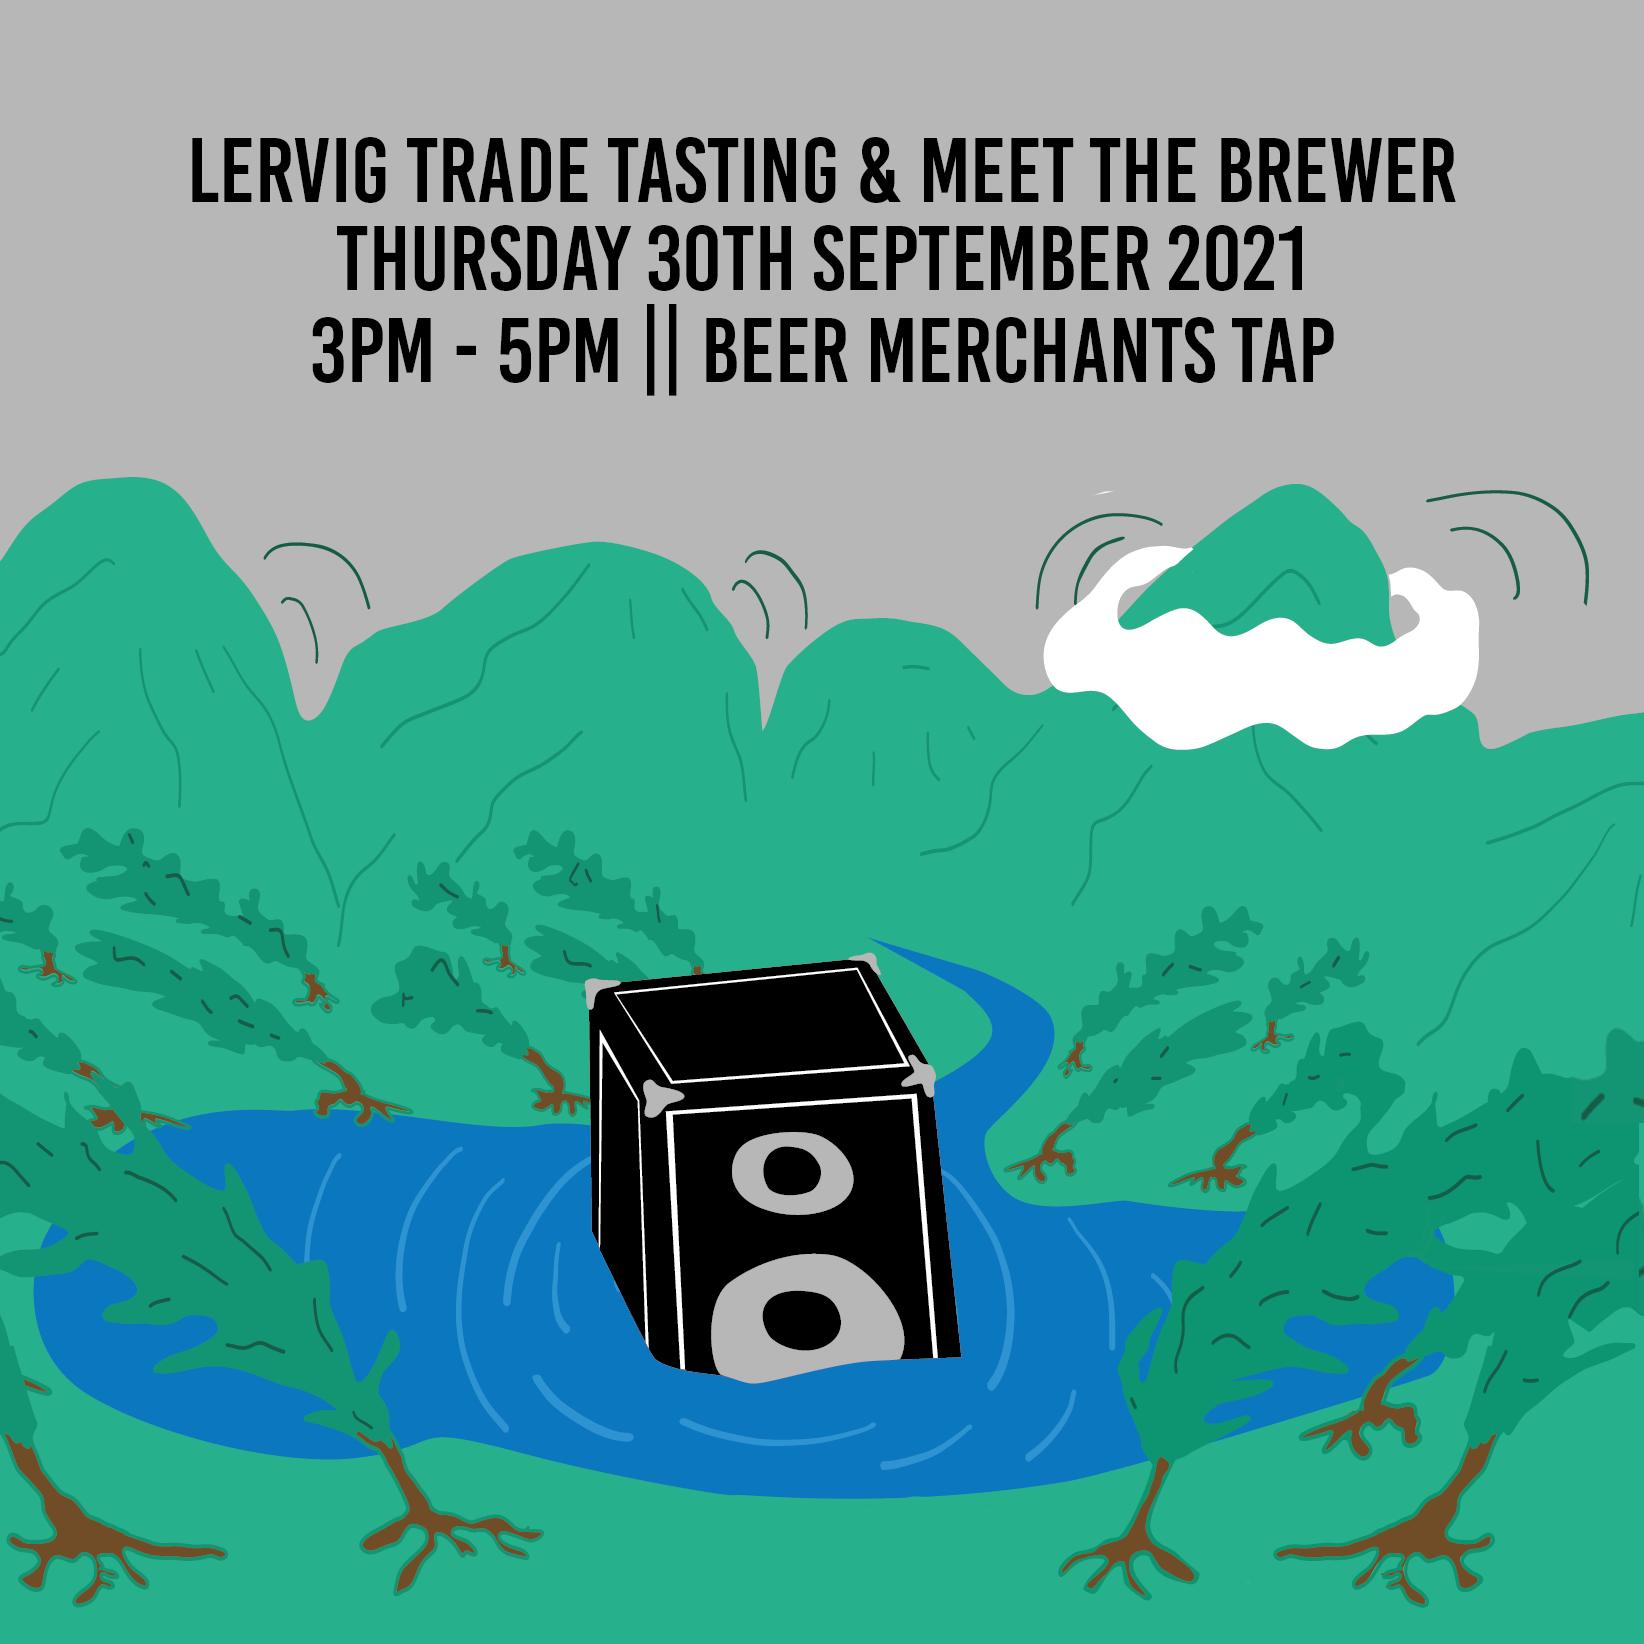 Lervig Trade Tasting Invitation